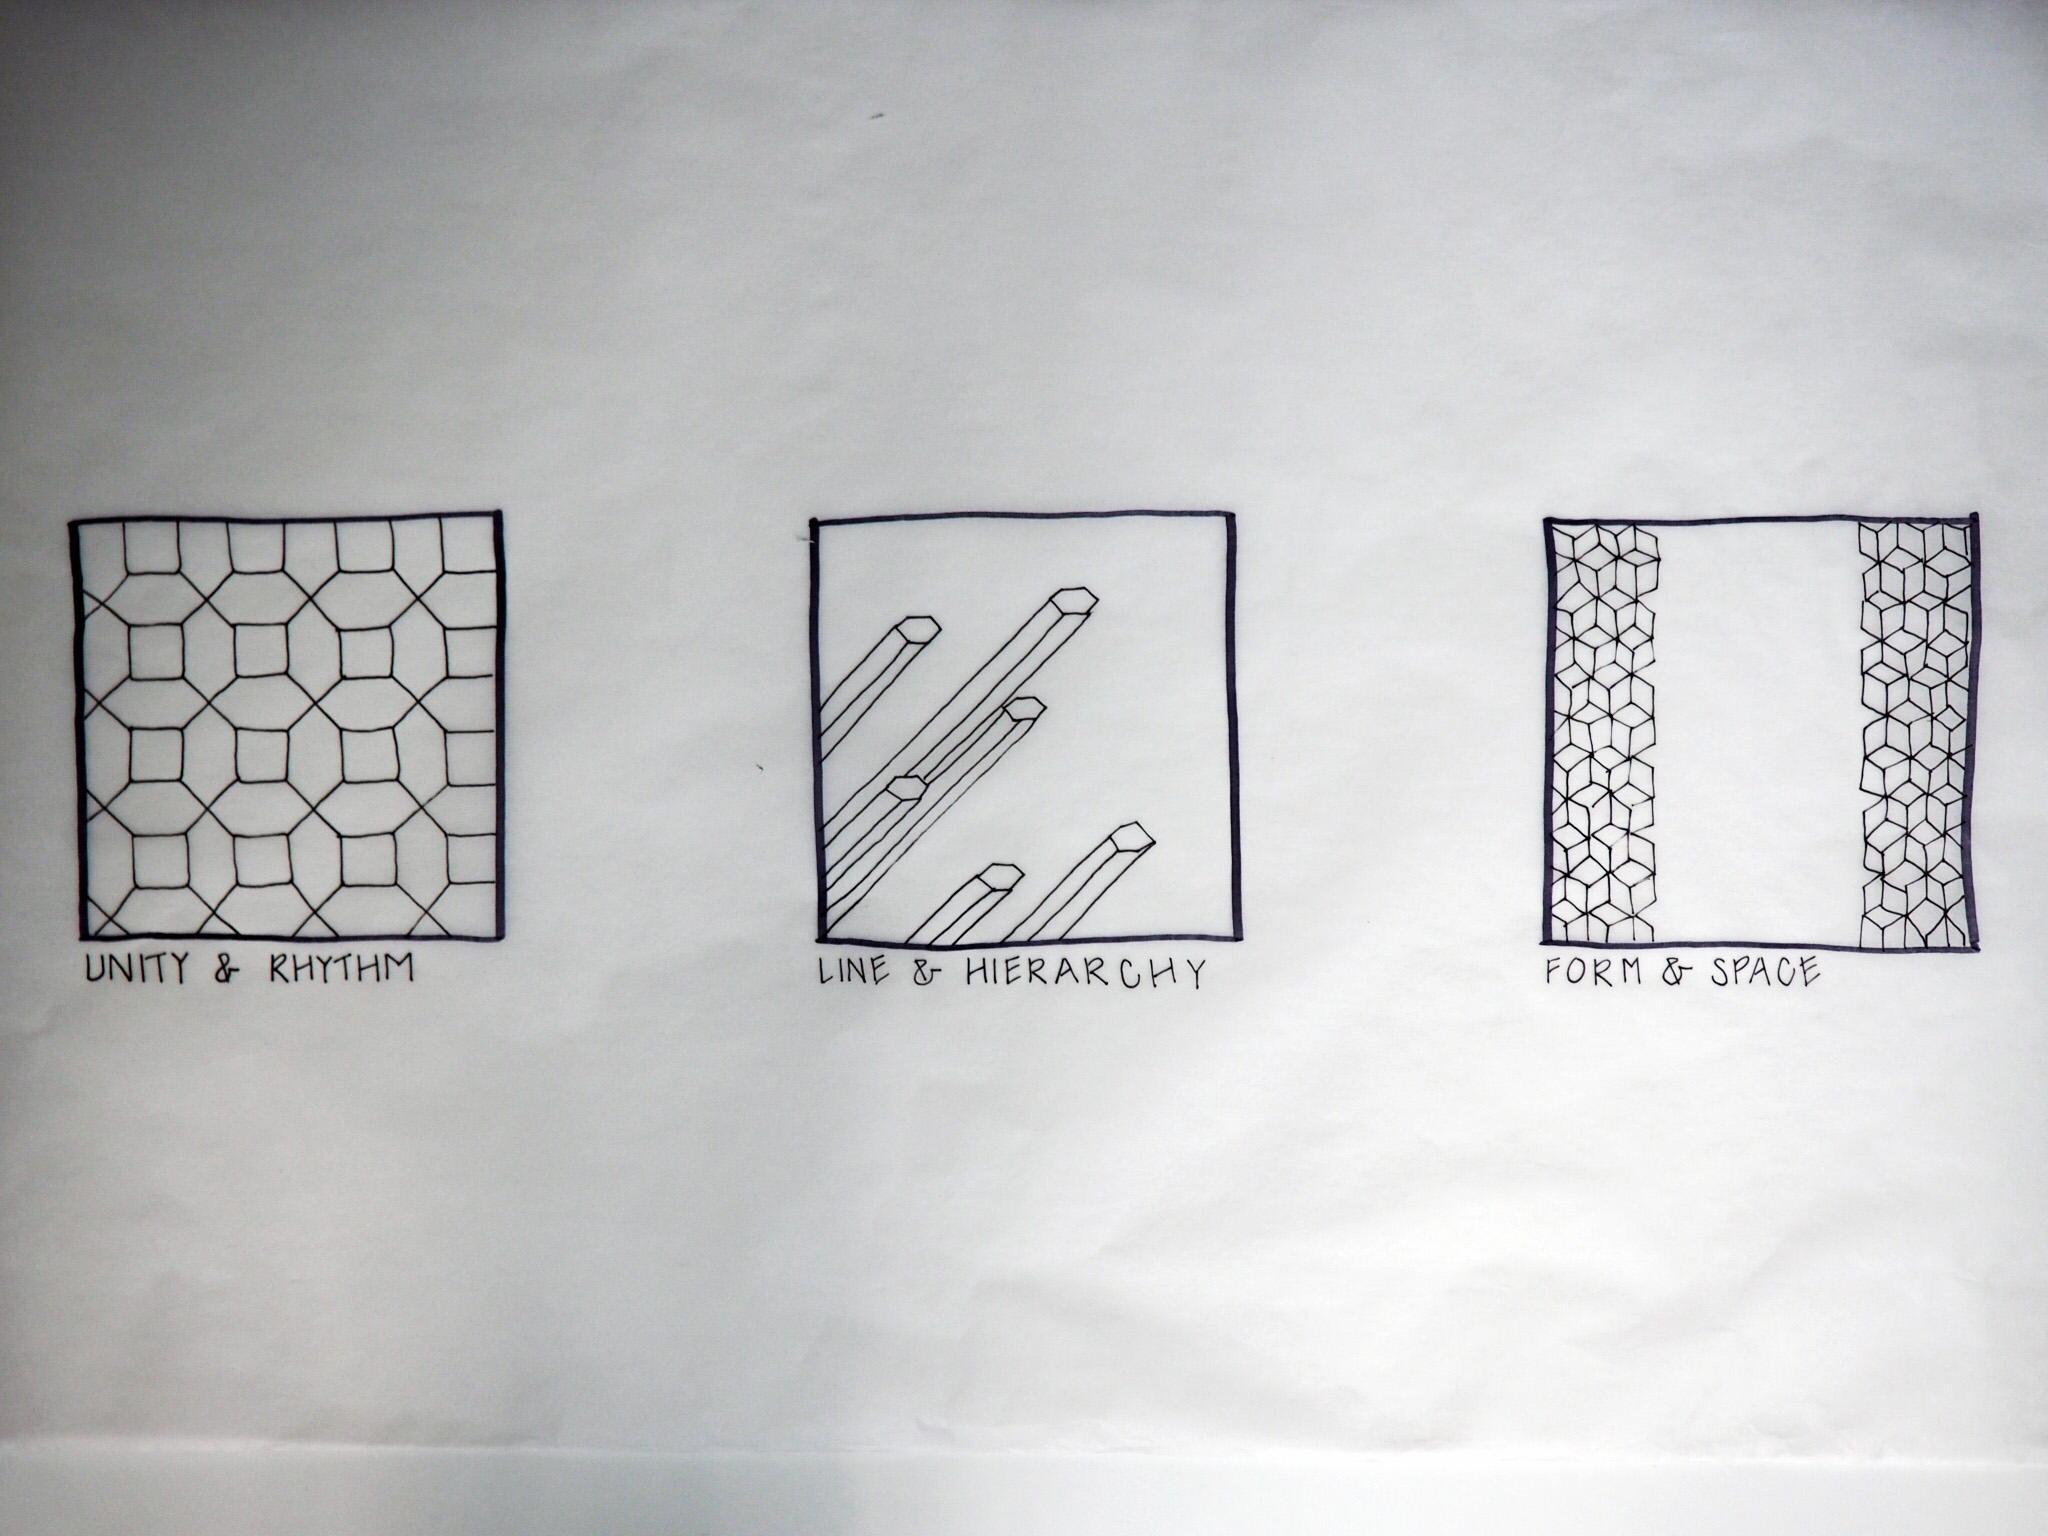 P2_Elements&Principles.jpg